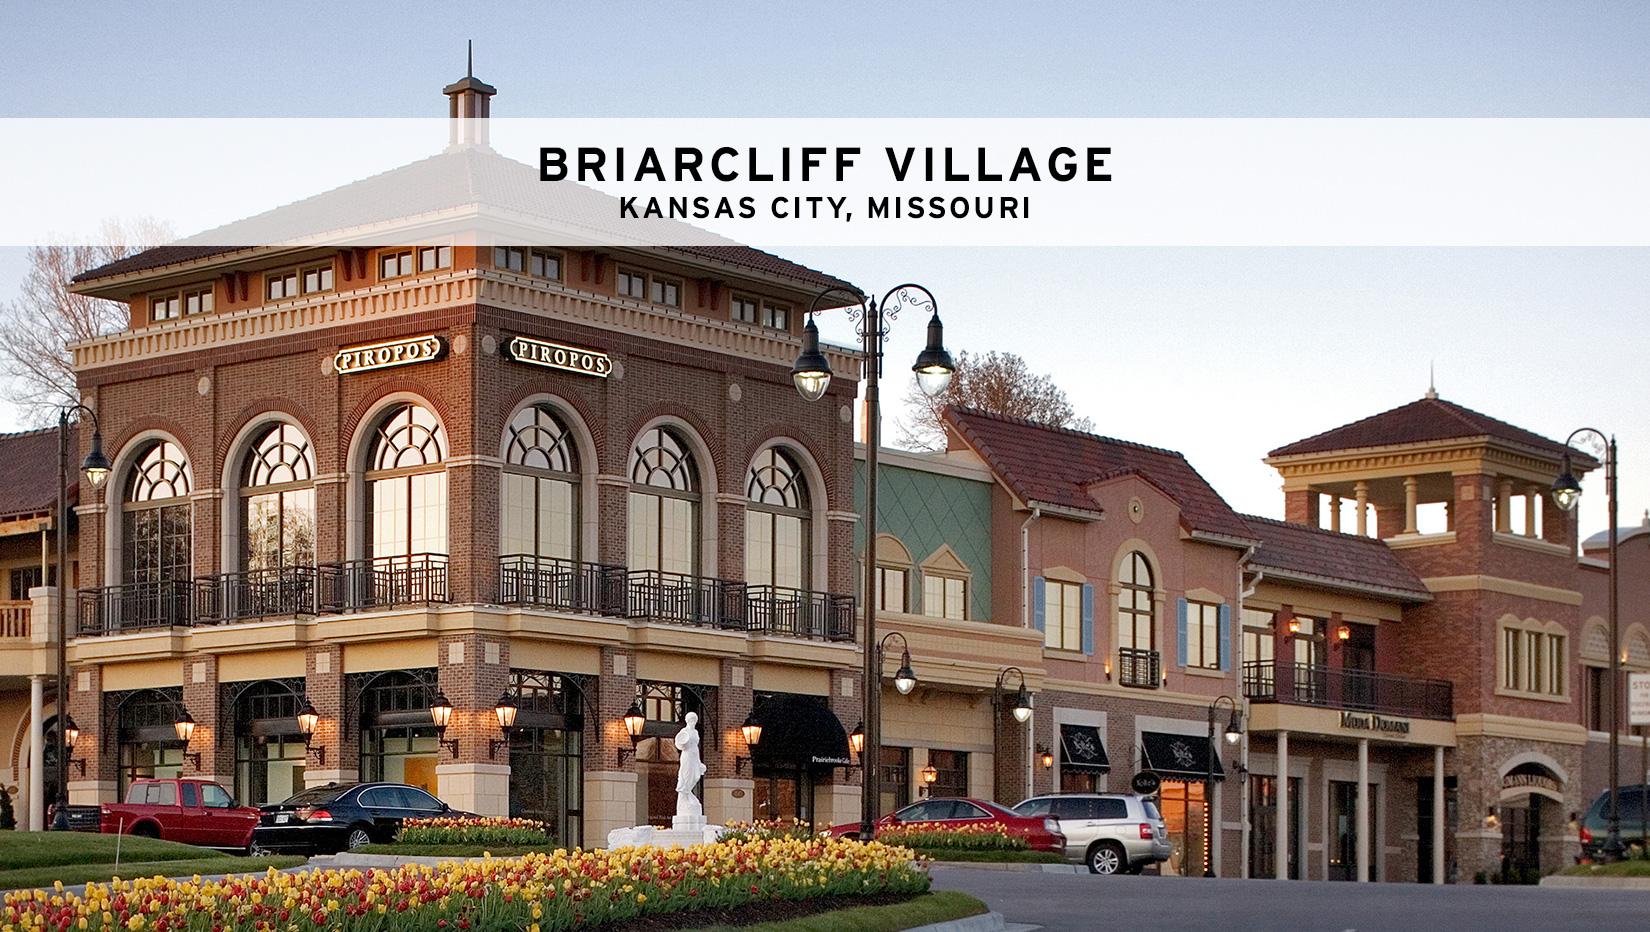 briarcliff01.jpg